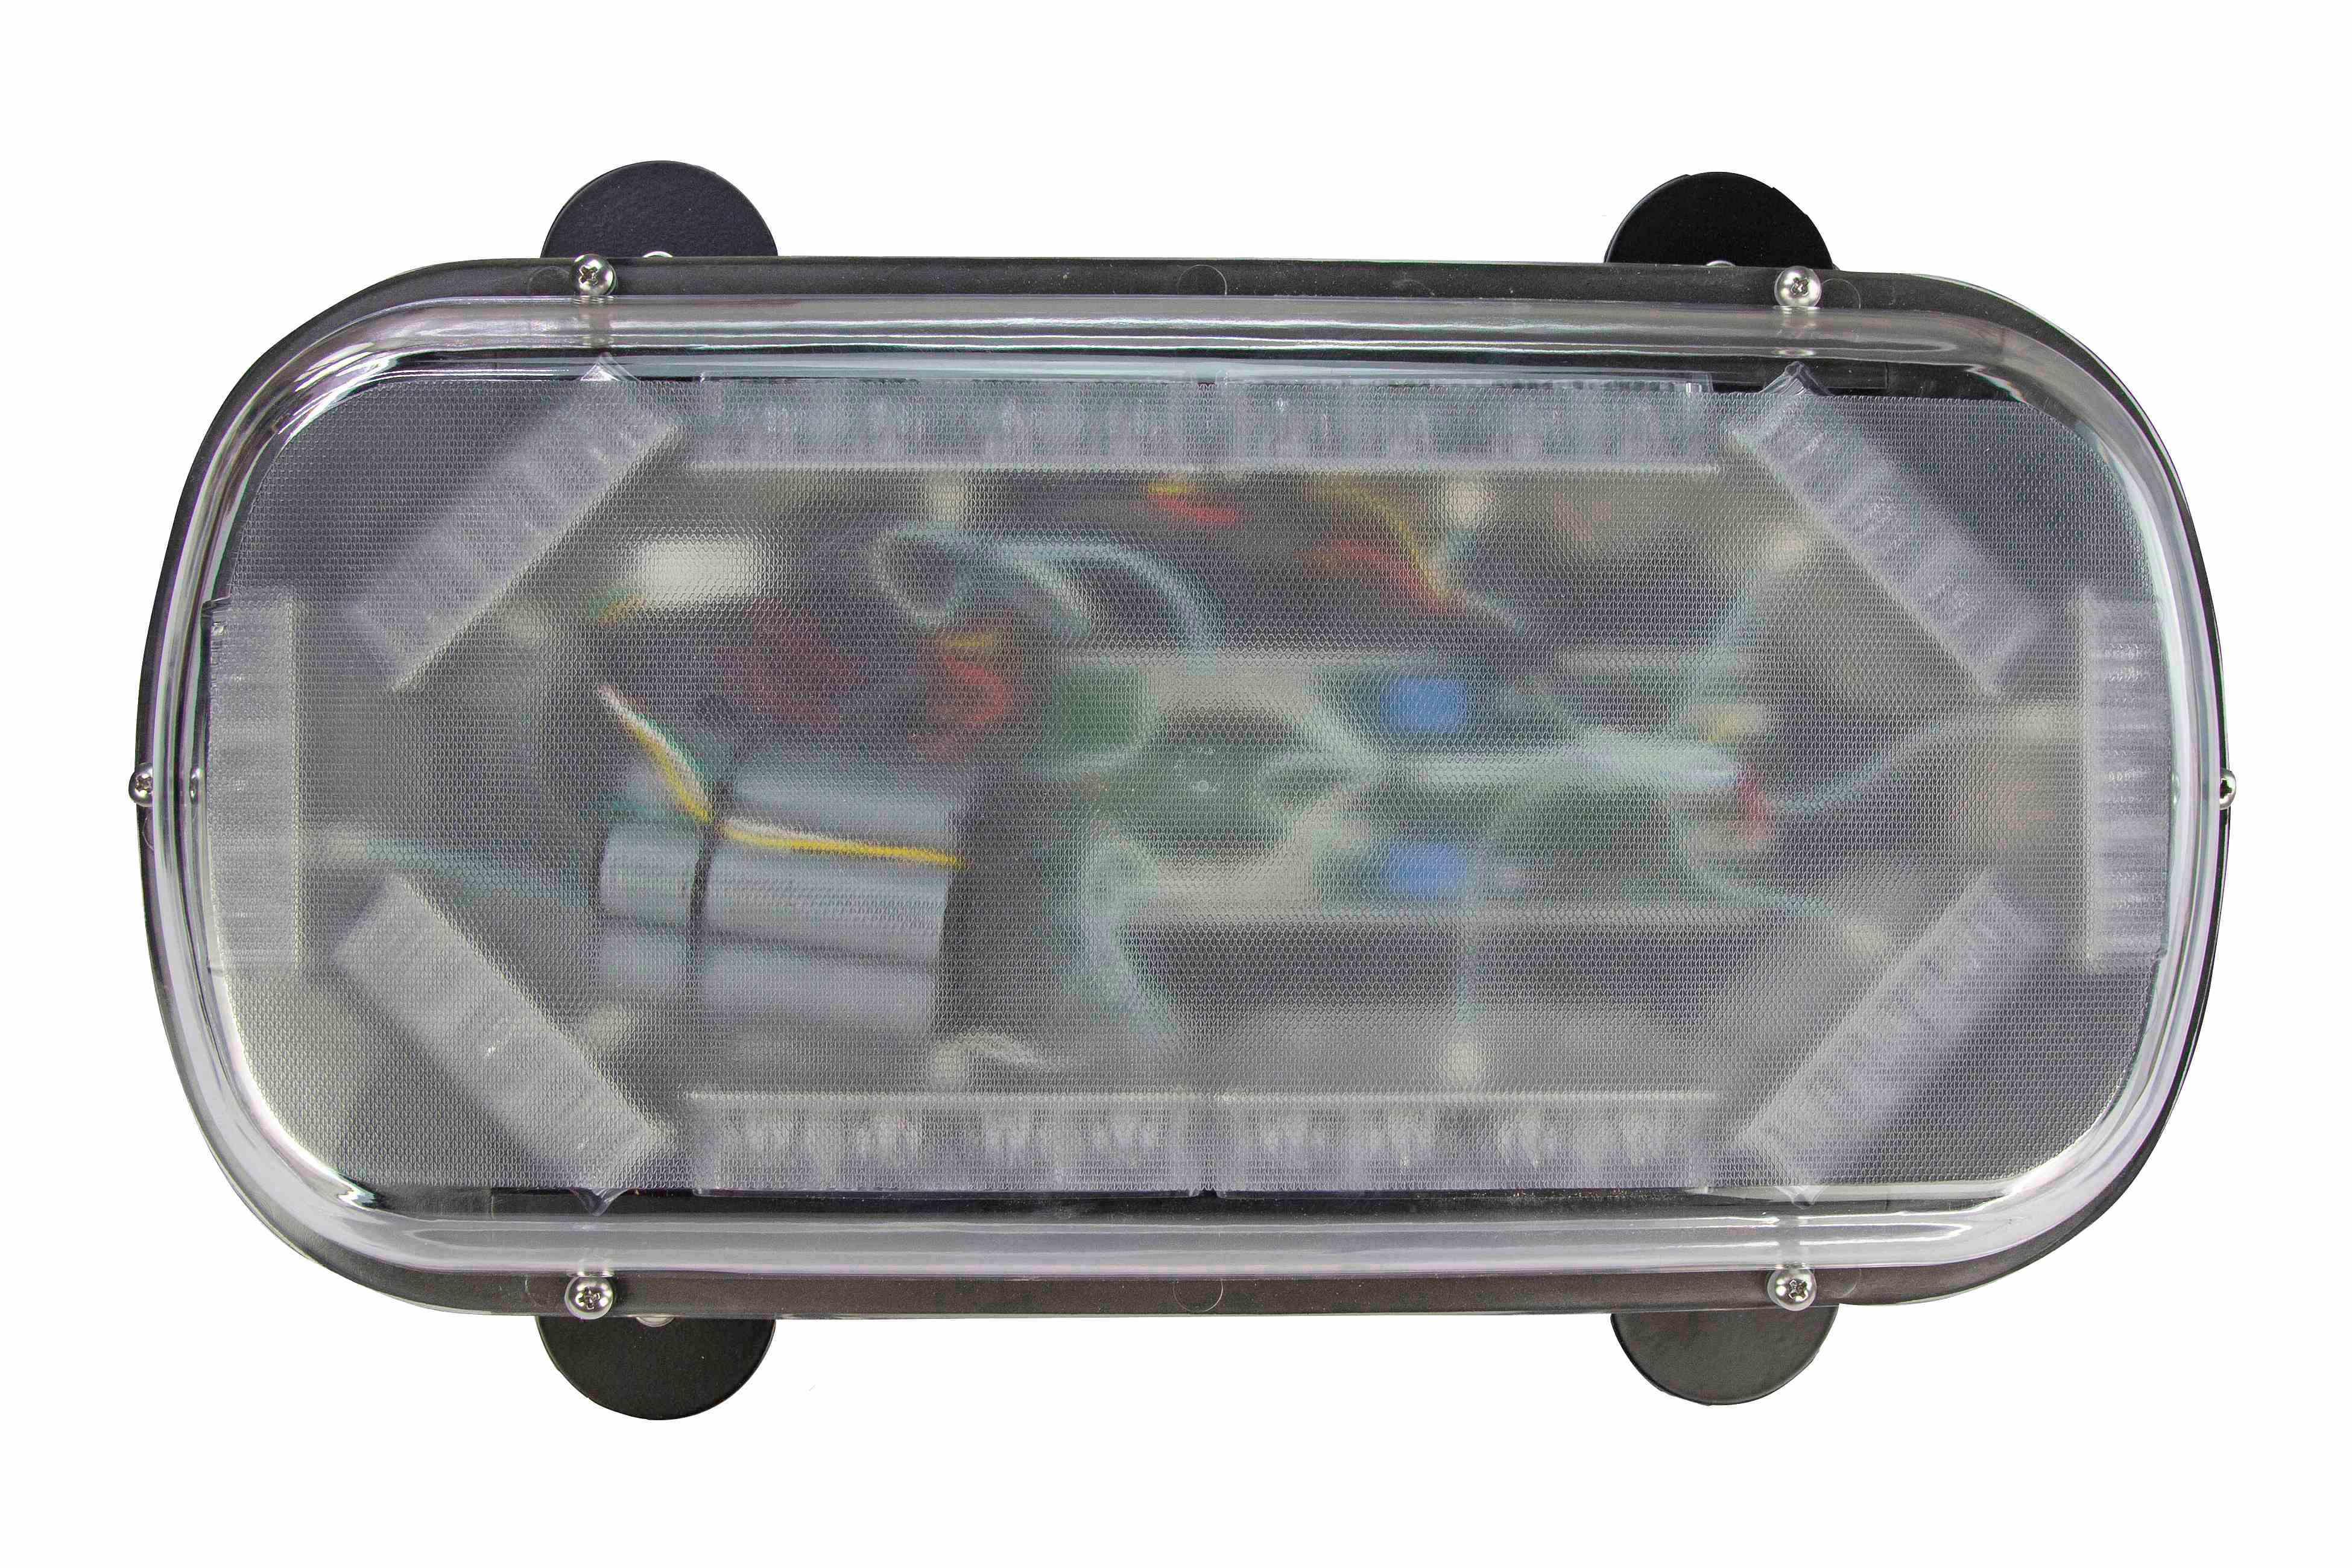 40w low profile led strobe light bar 4 magnetic mount feet 10 hi res image 4 mini led strobe light bar aloadofball Images